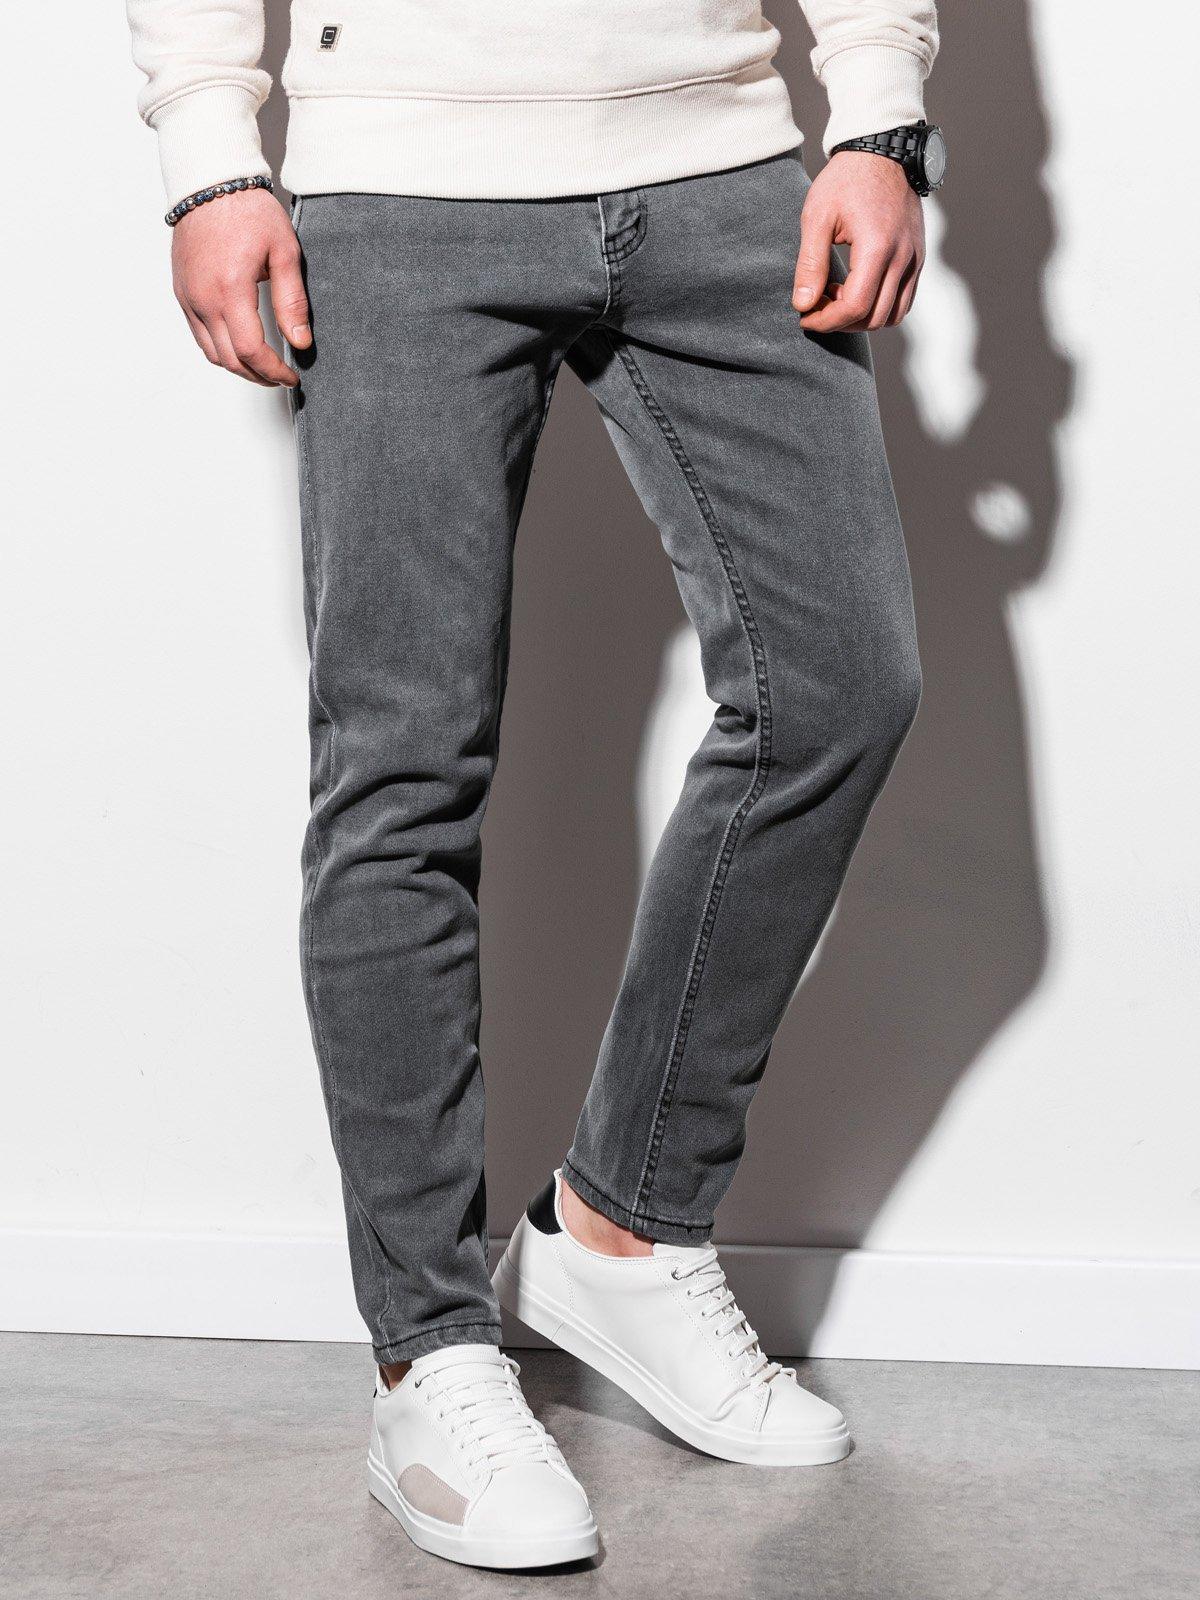 Pánské riflové kalhoty P942 - šedá